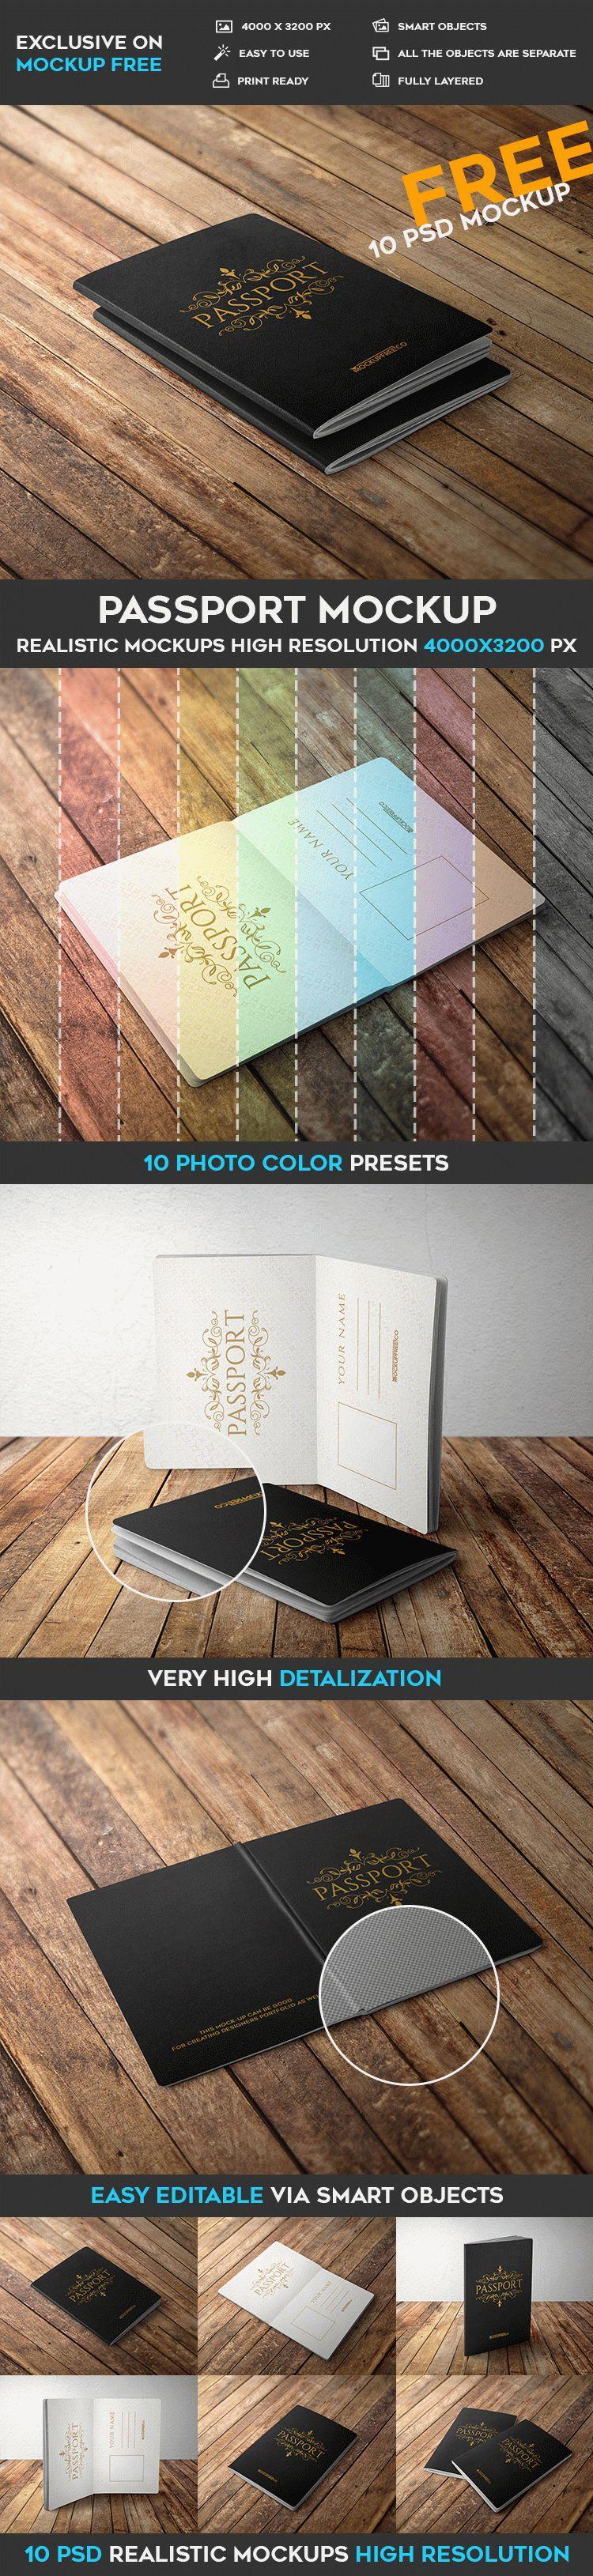 10 Free Passport PSD Mockups | Free PSD Templates | #free #photoshop ...